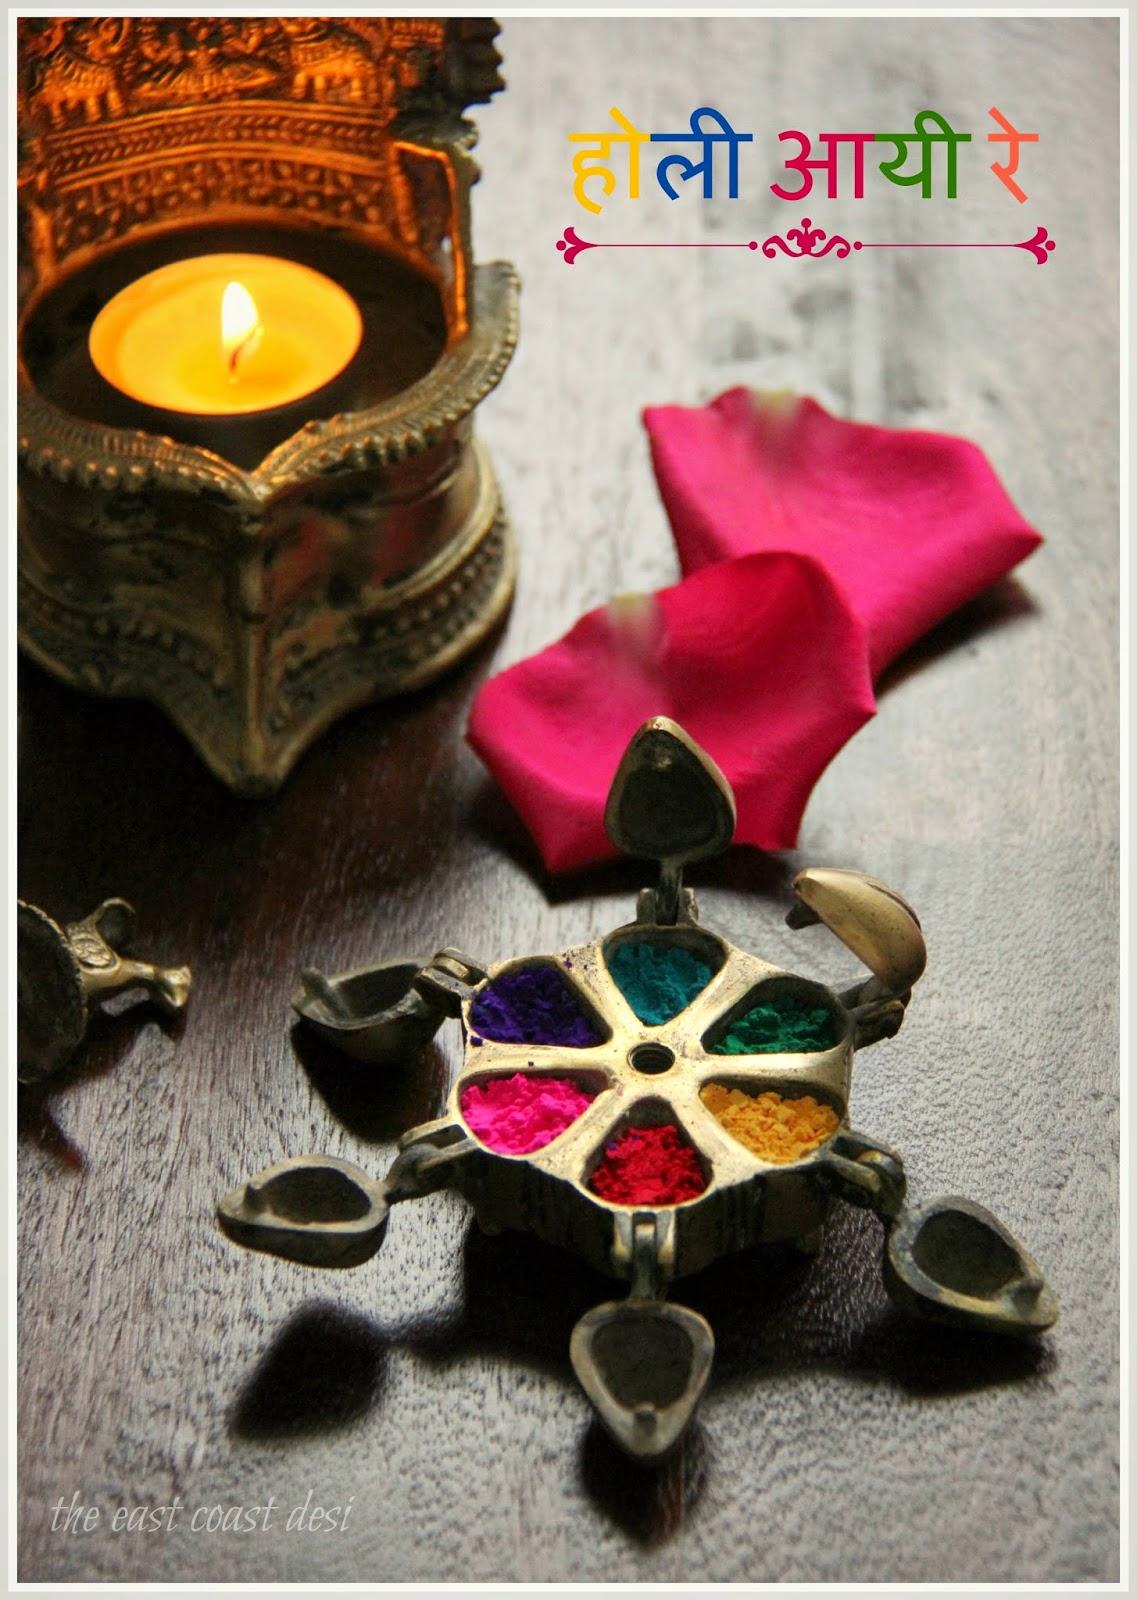 The east coast desi rang bhi rangi holi for Holi decorations at home